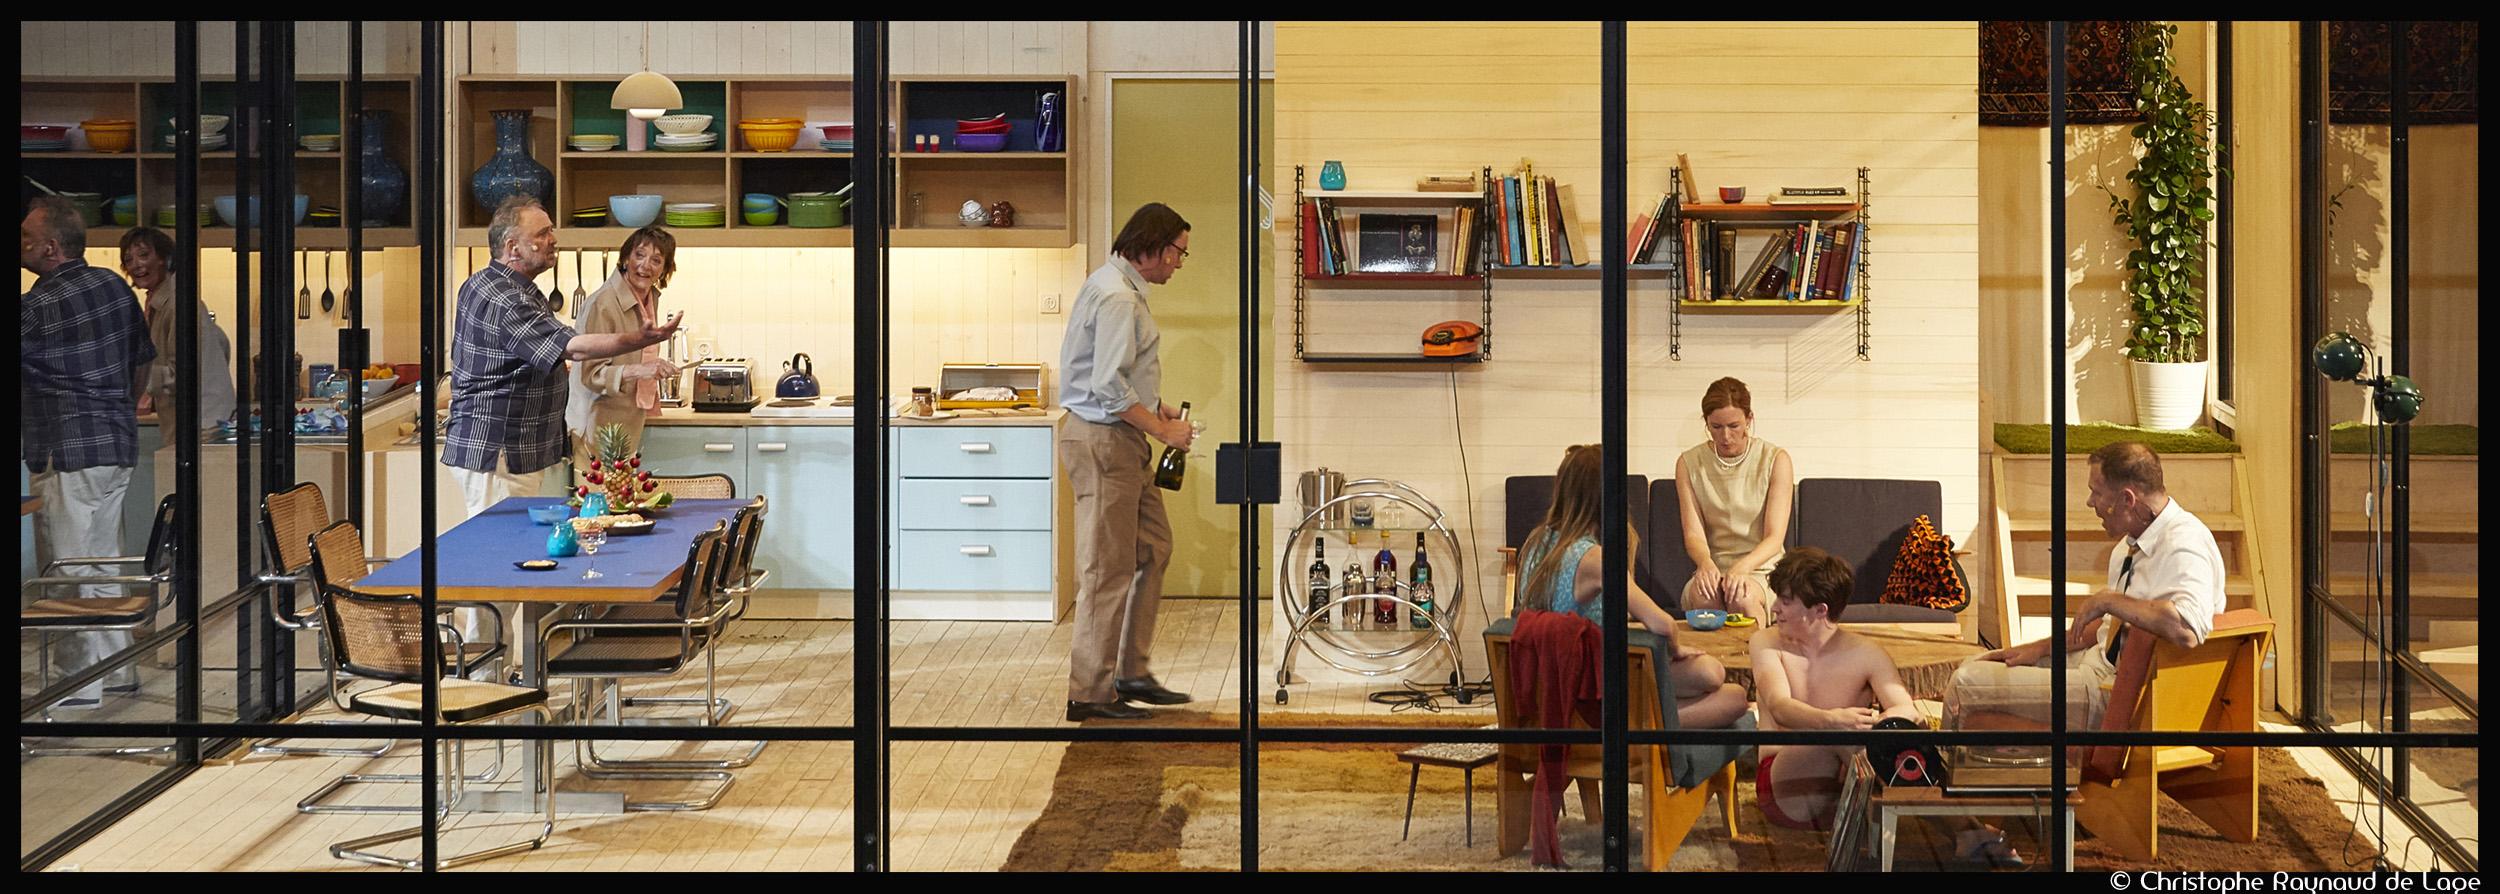 Couv_Ibsen-huis_170714_©-Christophe-Raynaud-de-Lage_0676_@loeildoliv